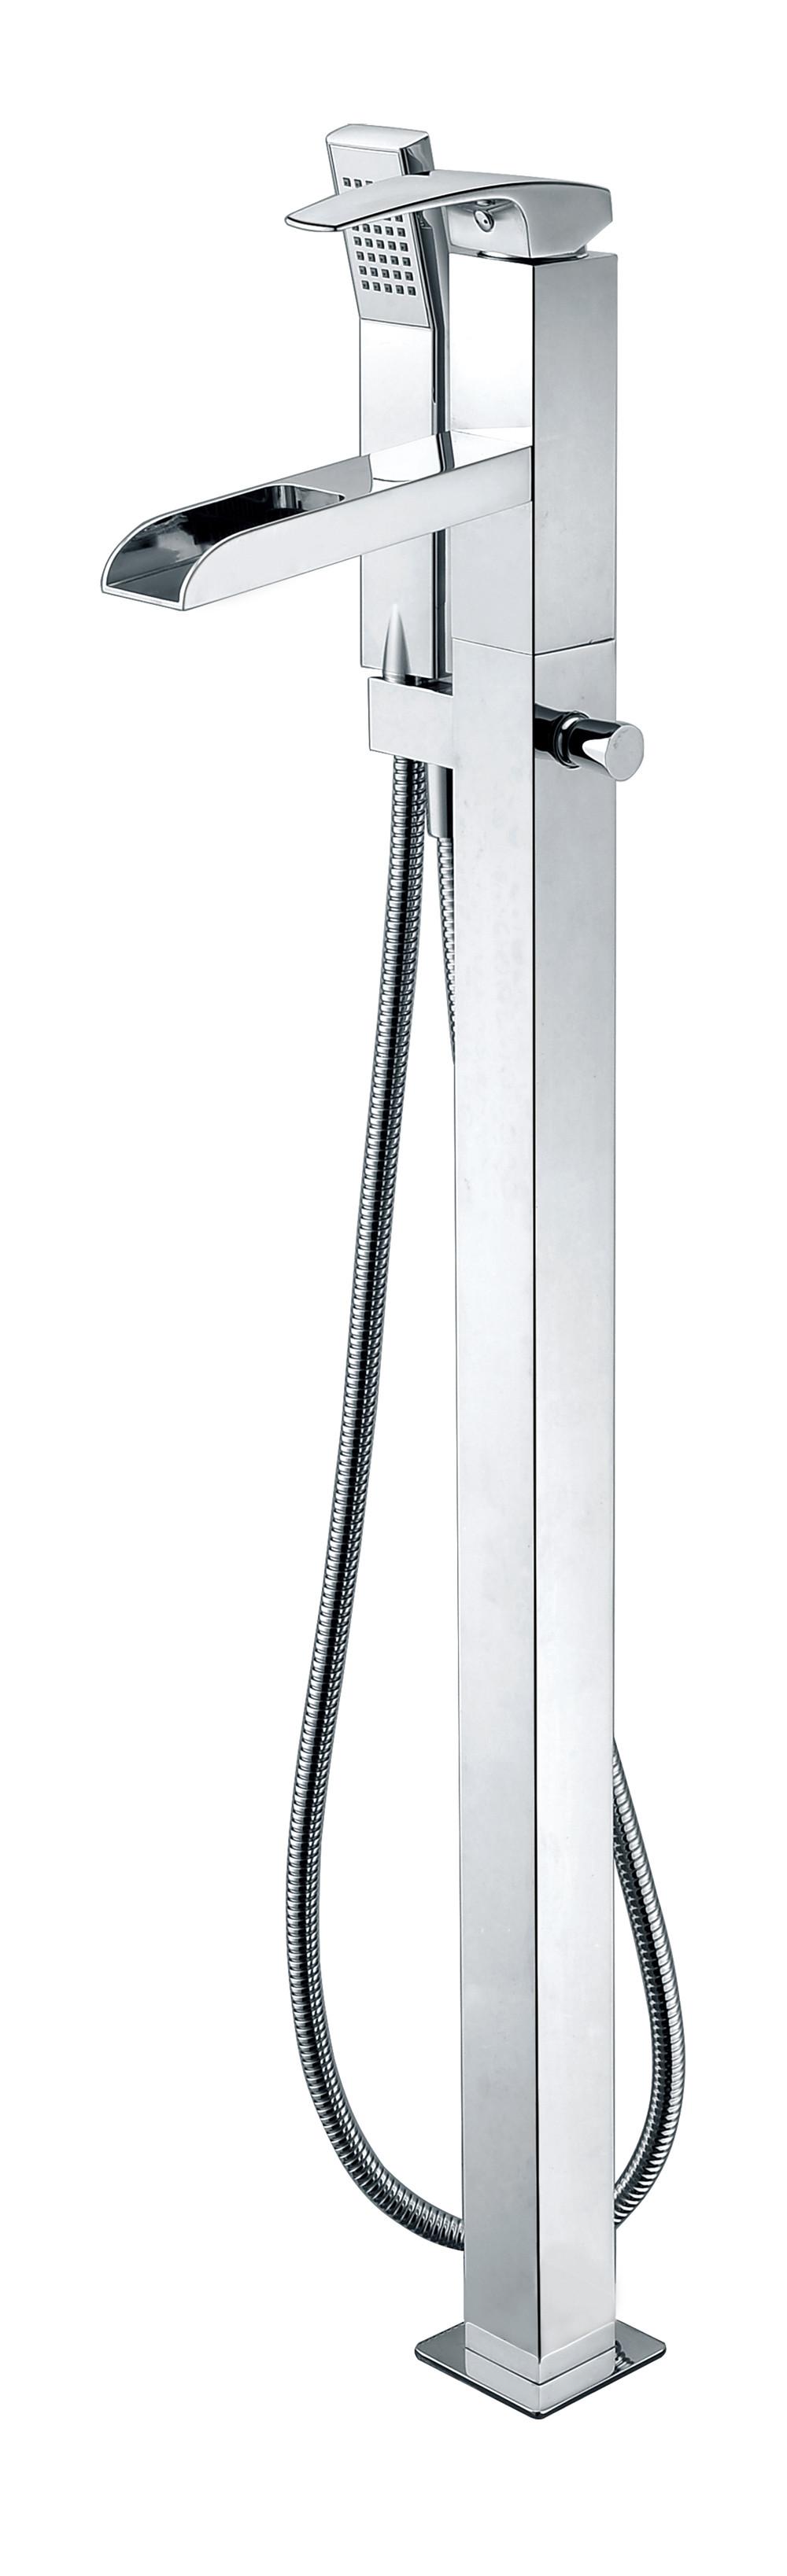 ALFI brand AB2843 Single Hole Floor Mounted Waterfall Tub Filler